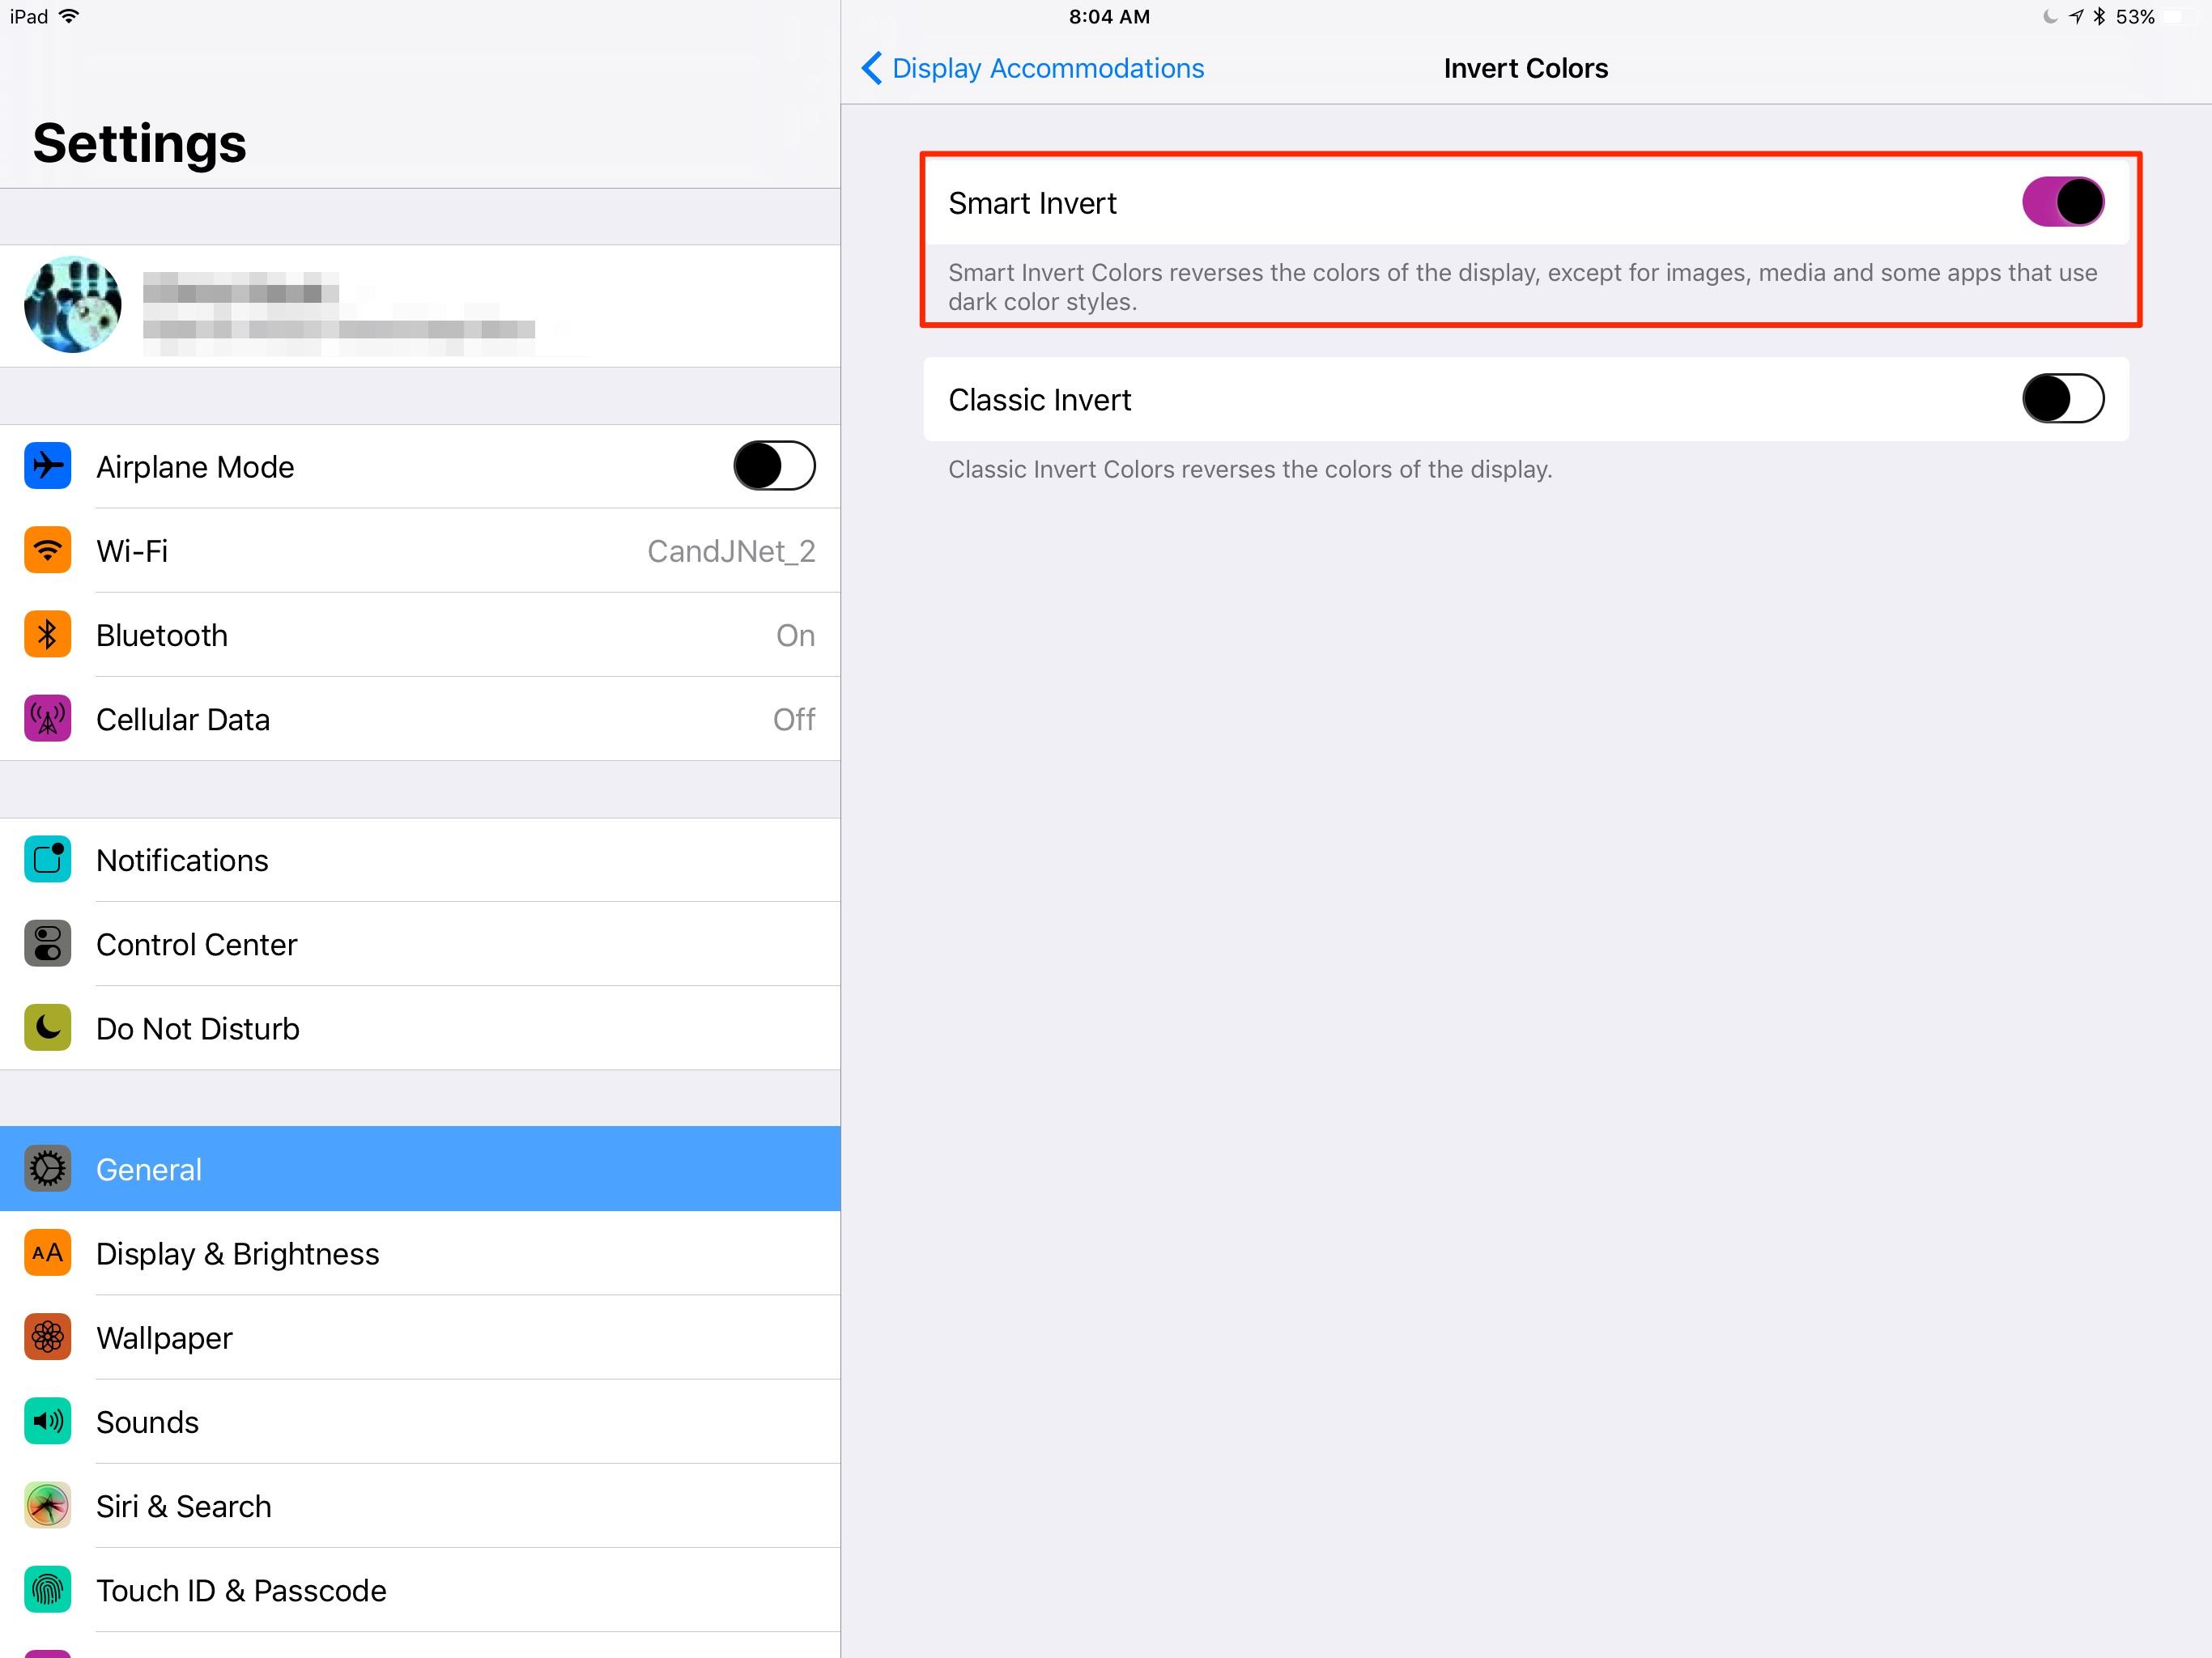 iOS 11 How To: Turn on Smart Invert 'Dark Mode' in iOS 11